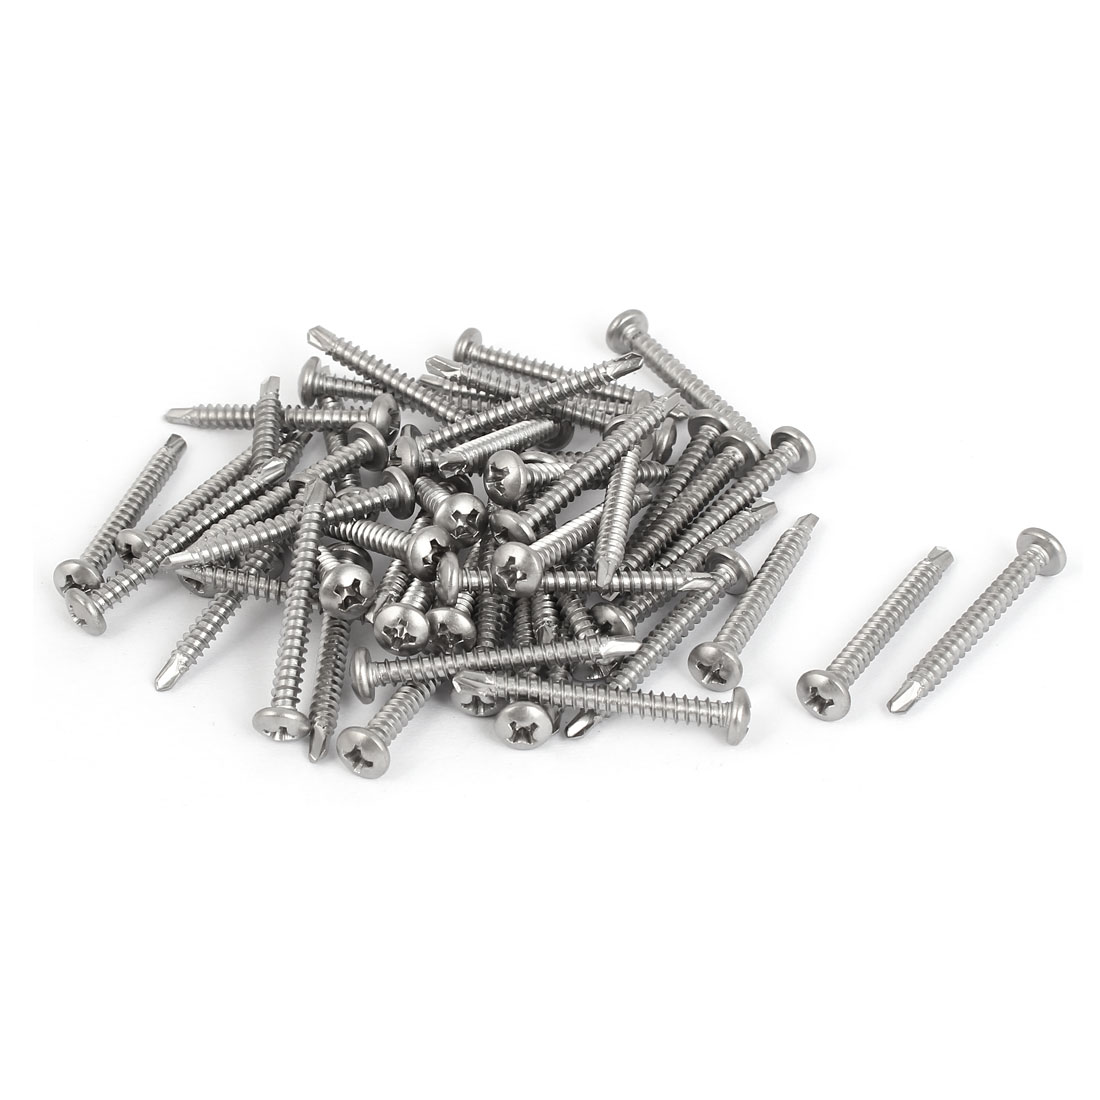 M3.5 x 32mm Thread 410 Stainless Steel Pan Head Self Drilling Screws 50 Pcs